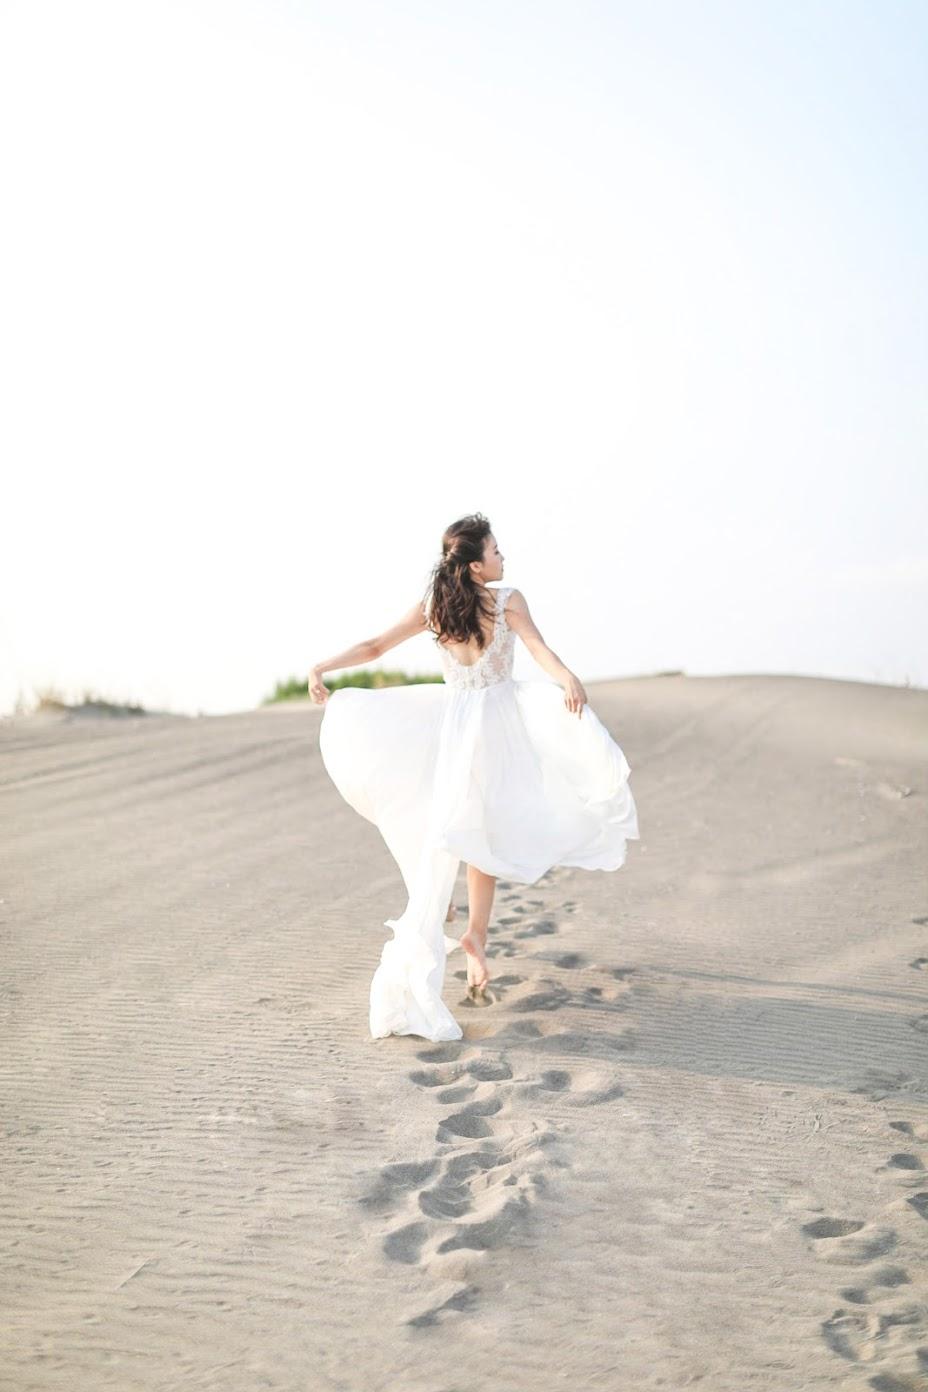 [AG婚誌]淺談婚紗挑選:如何挑選適合妳也適合Amazing Grace拍攝風格的婚紗